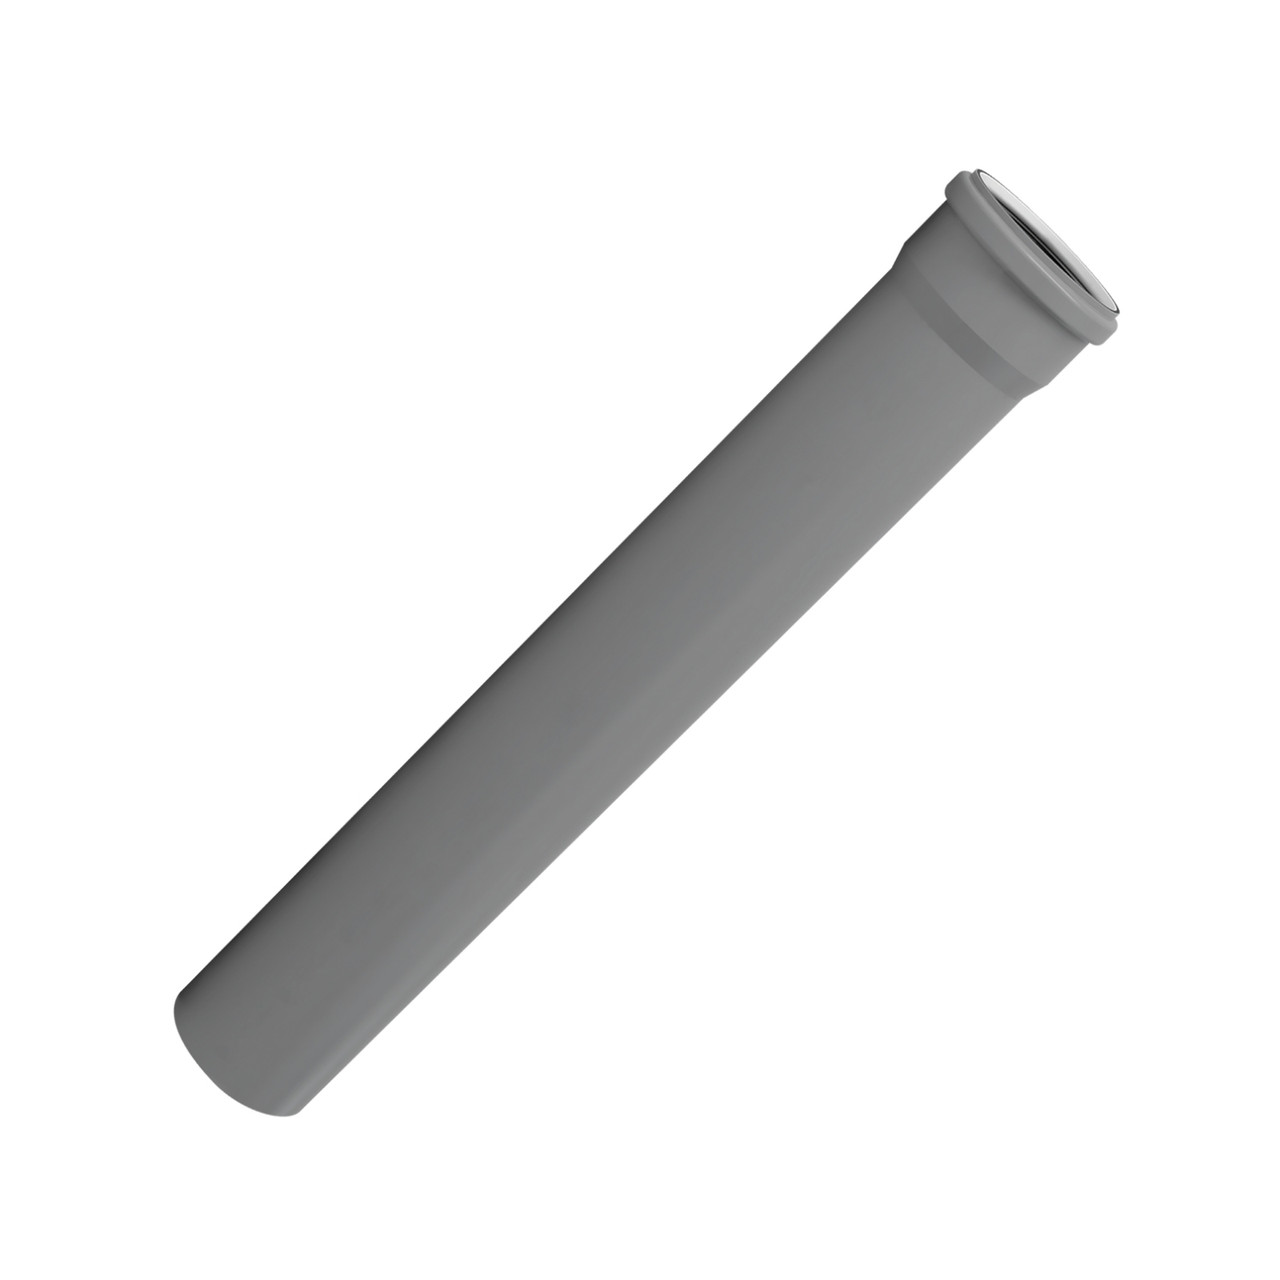 Труба с раструбом VALSIR PP3® Ø50 L=1000 мм 17 dB(A)